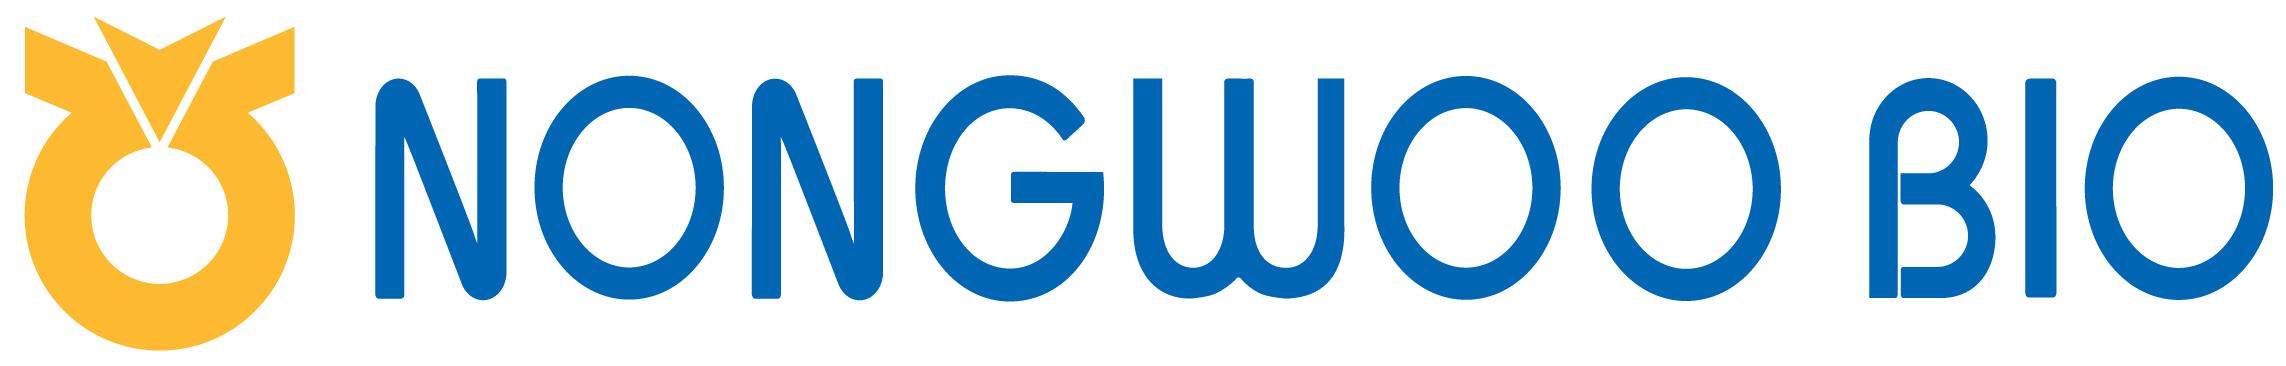 Logo-Nongwoobio